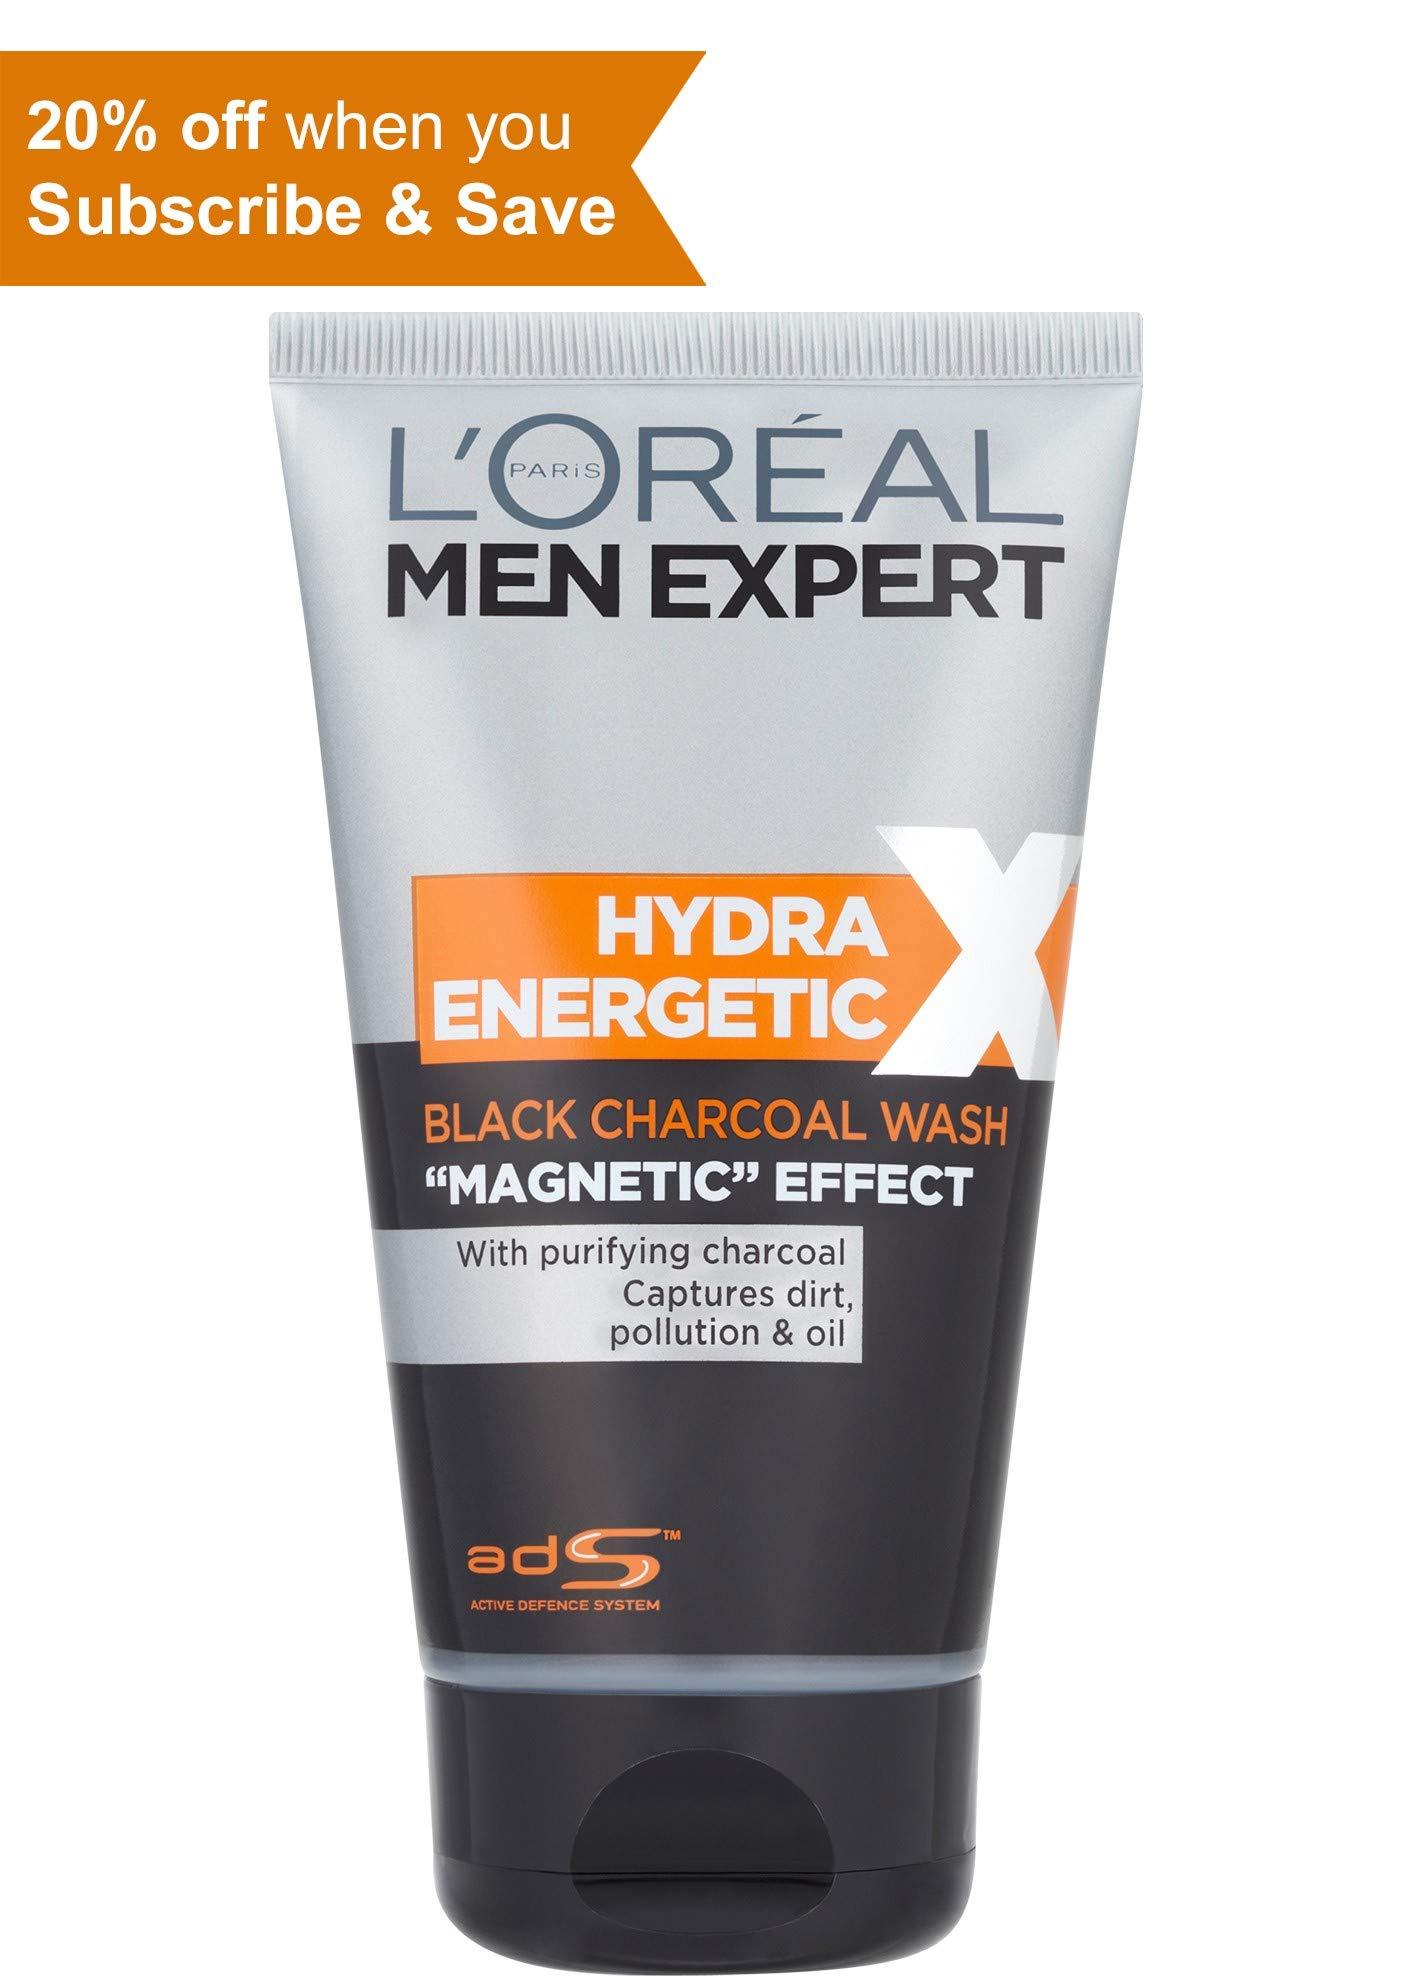 L'Oreal Men Expert Hydra Energetic París Xtreme Gel Limpiador 150ml Carbón magnética